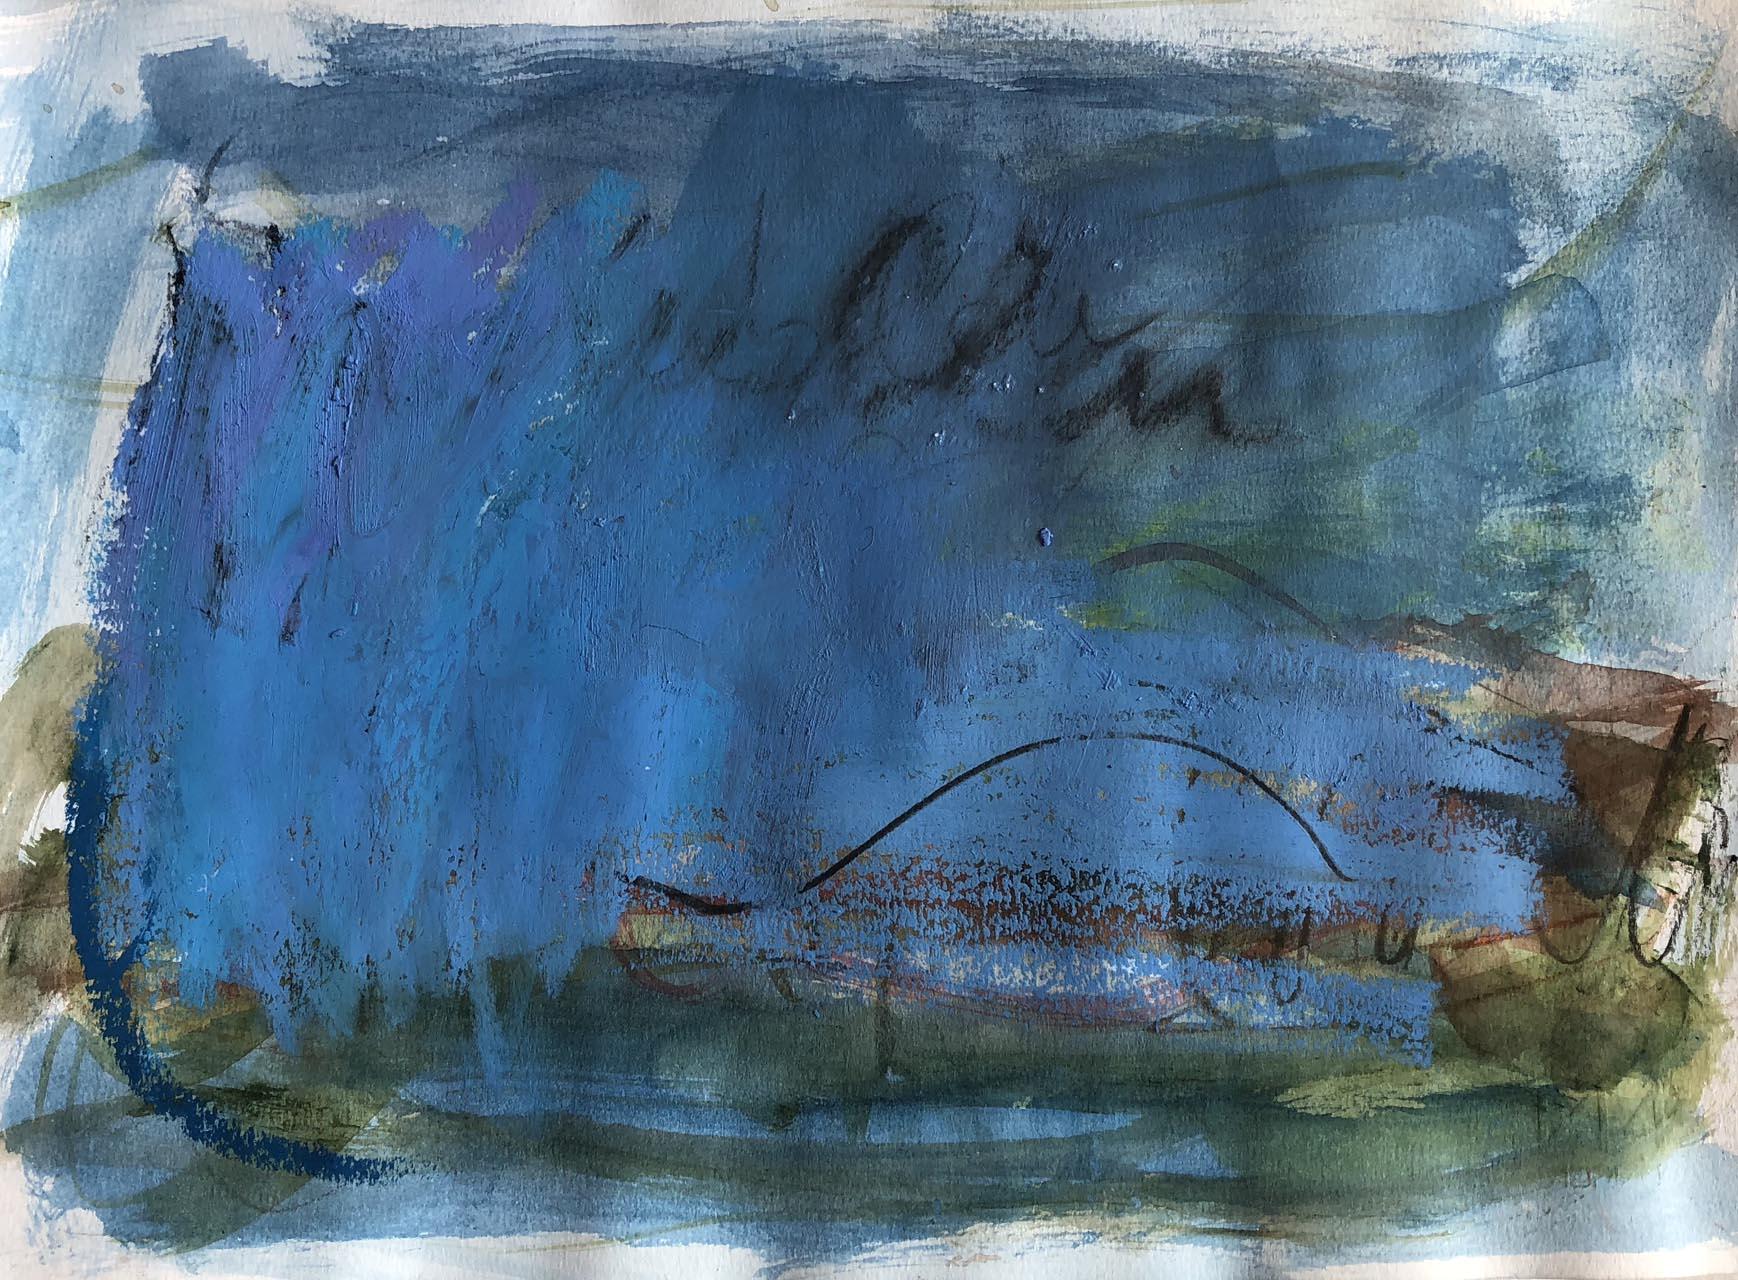 Landschaft-Cori 6-Ölpastell-30×40-2015